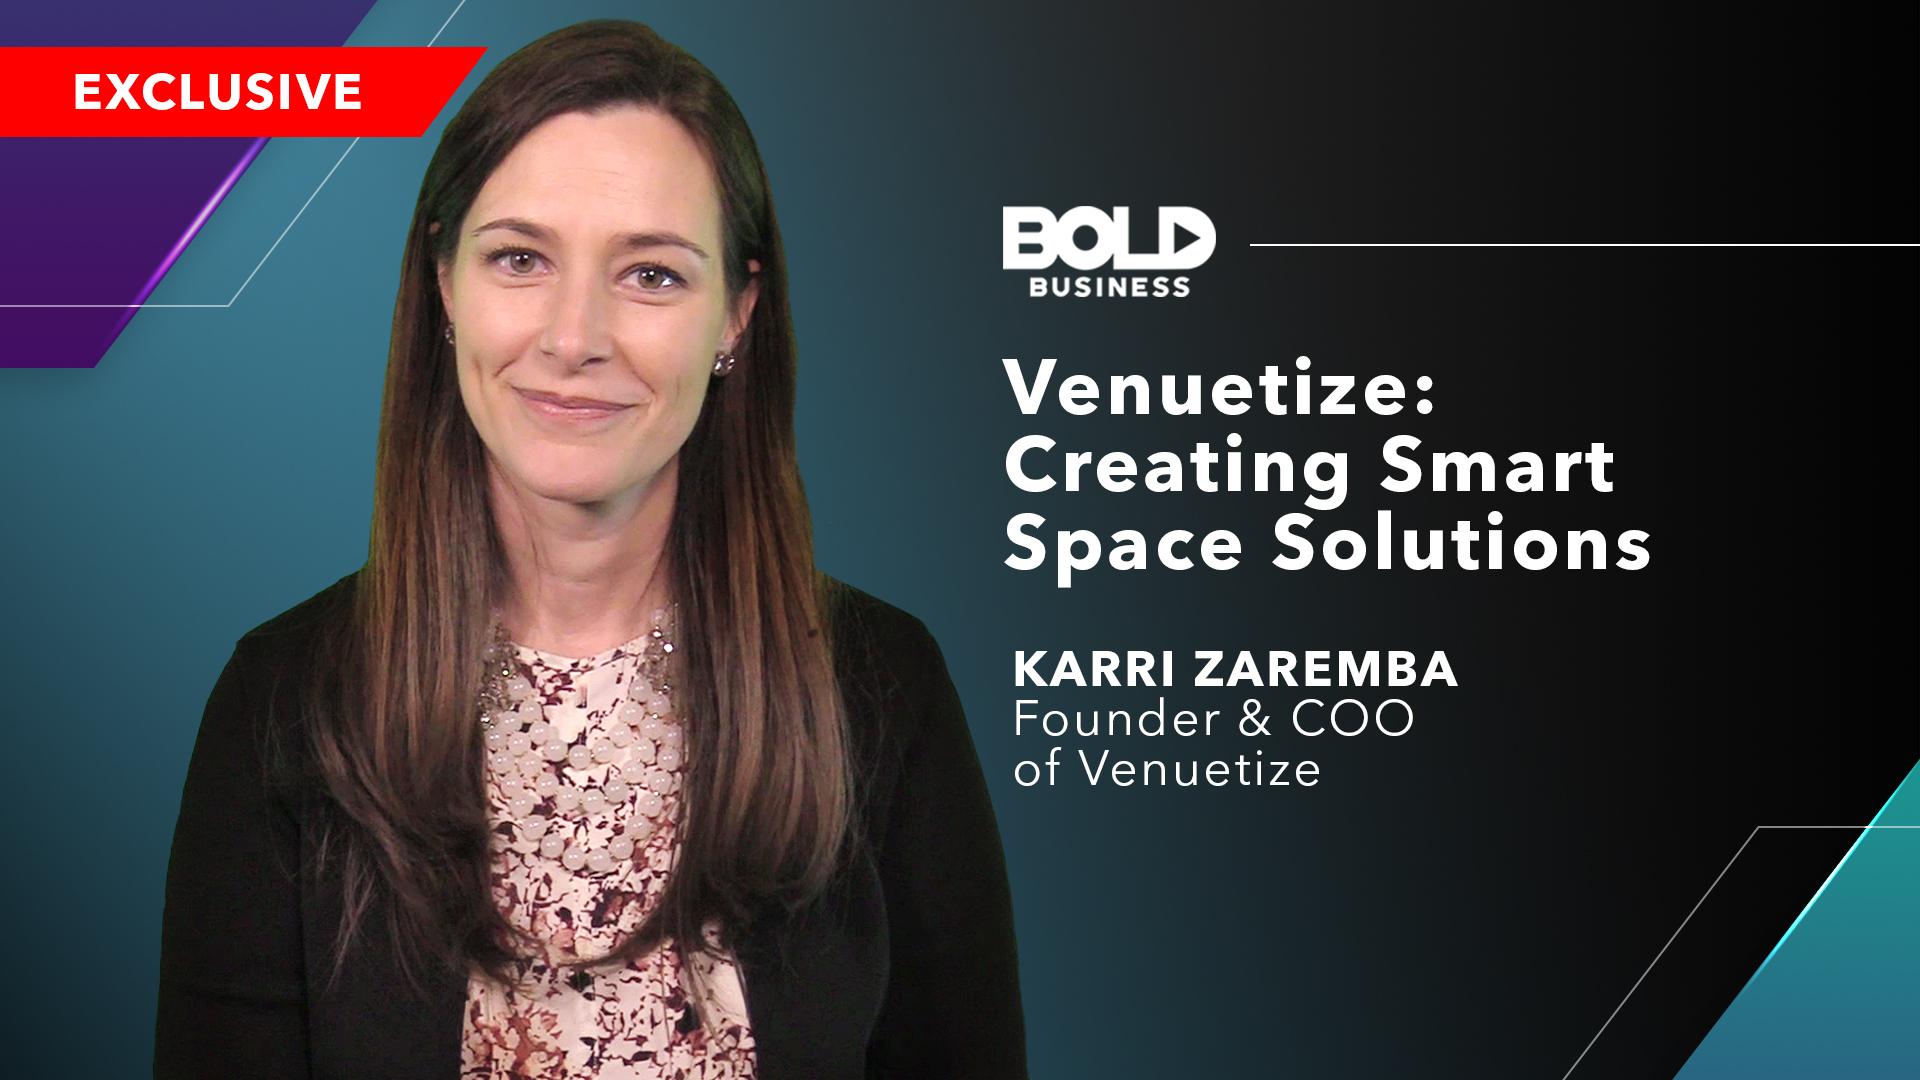 Venuetize: The Bold Business Behind Smarter Venues